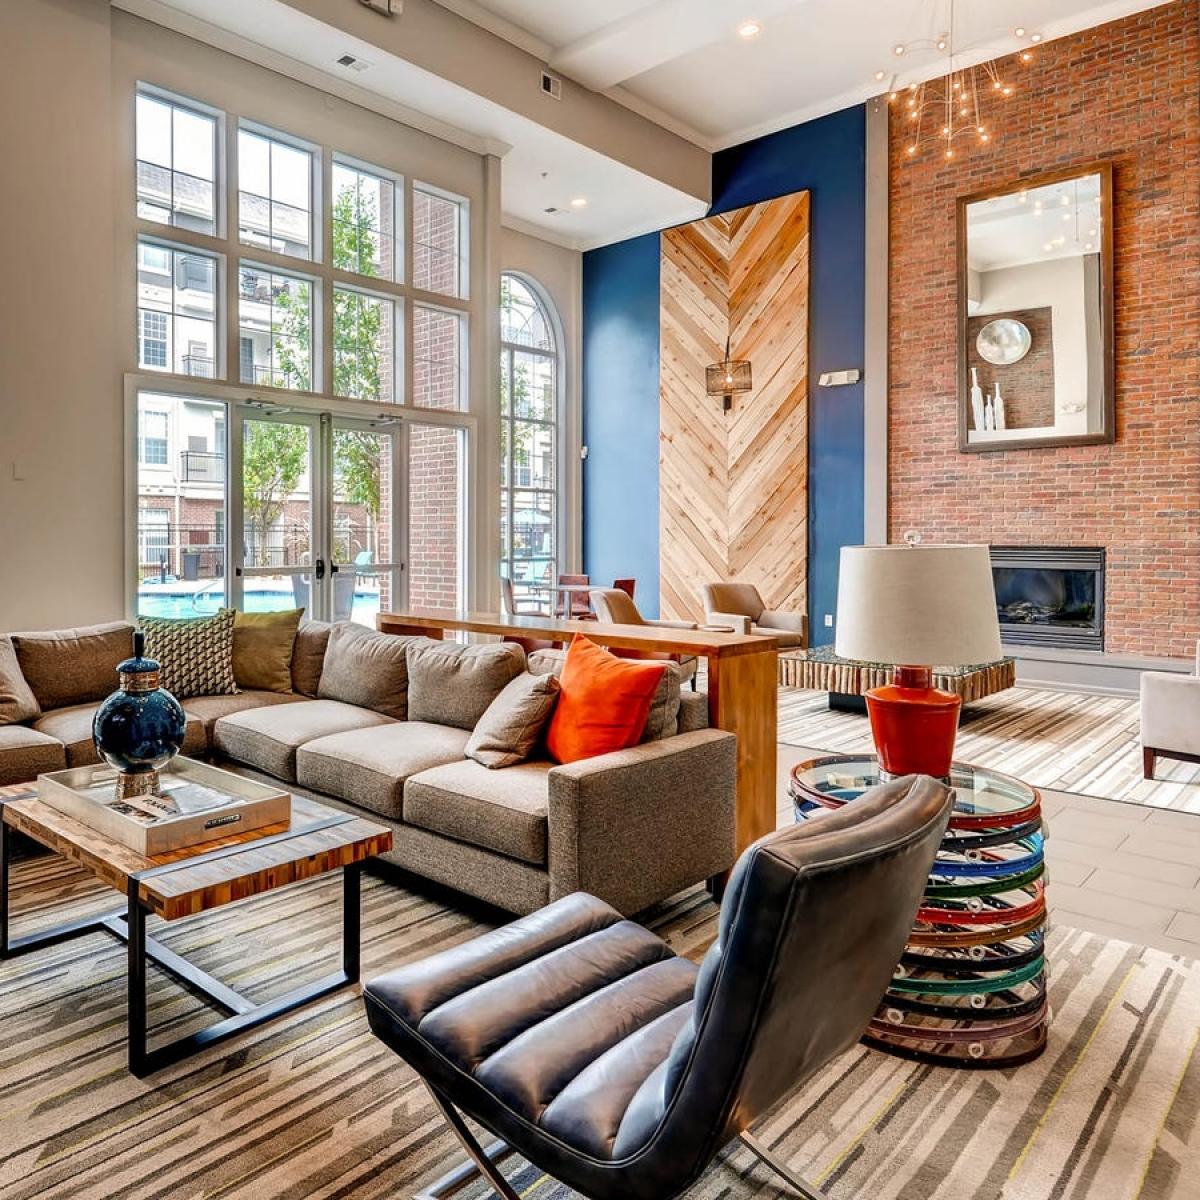 Alliance Residential | Lita Dirks & Co